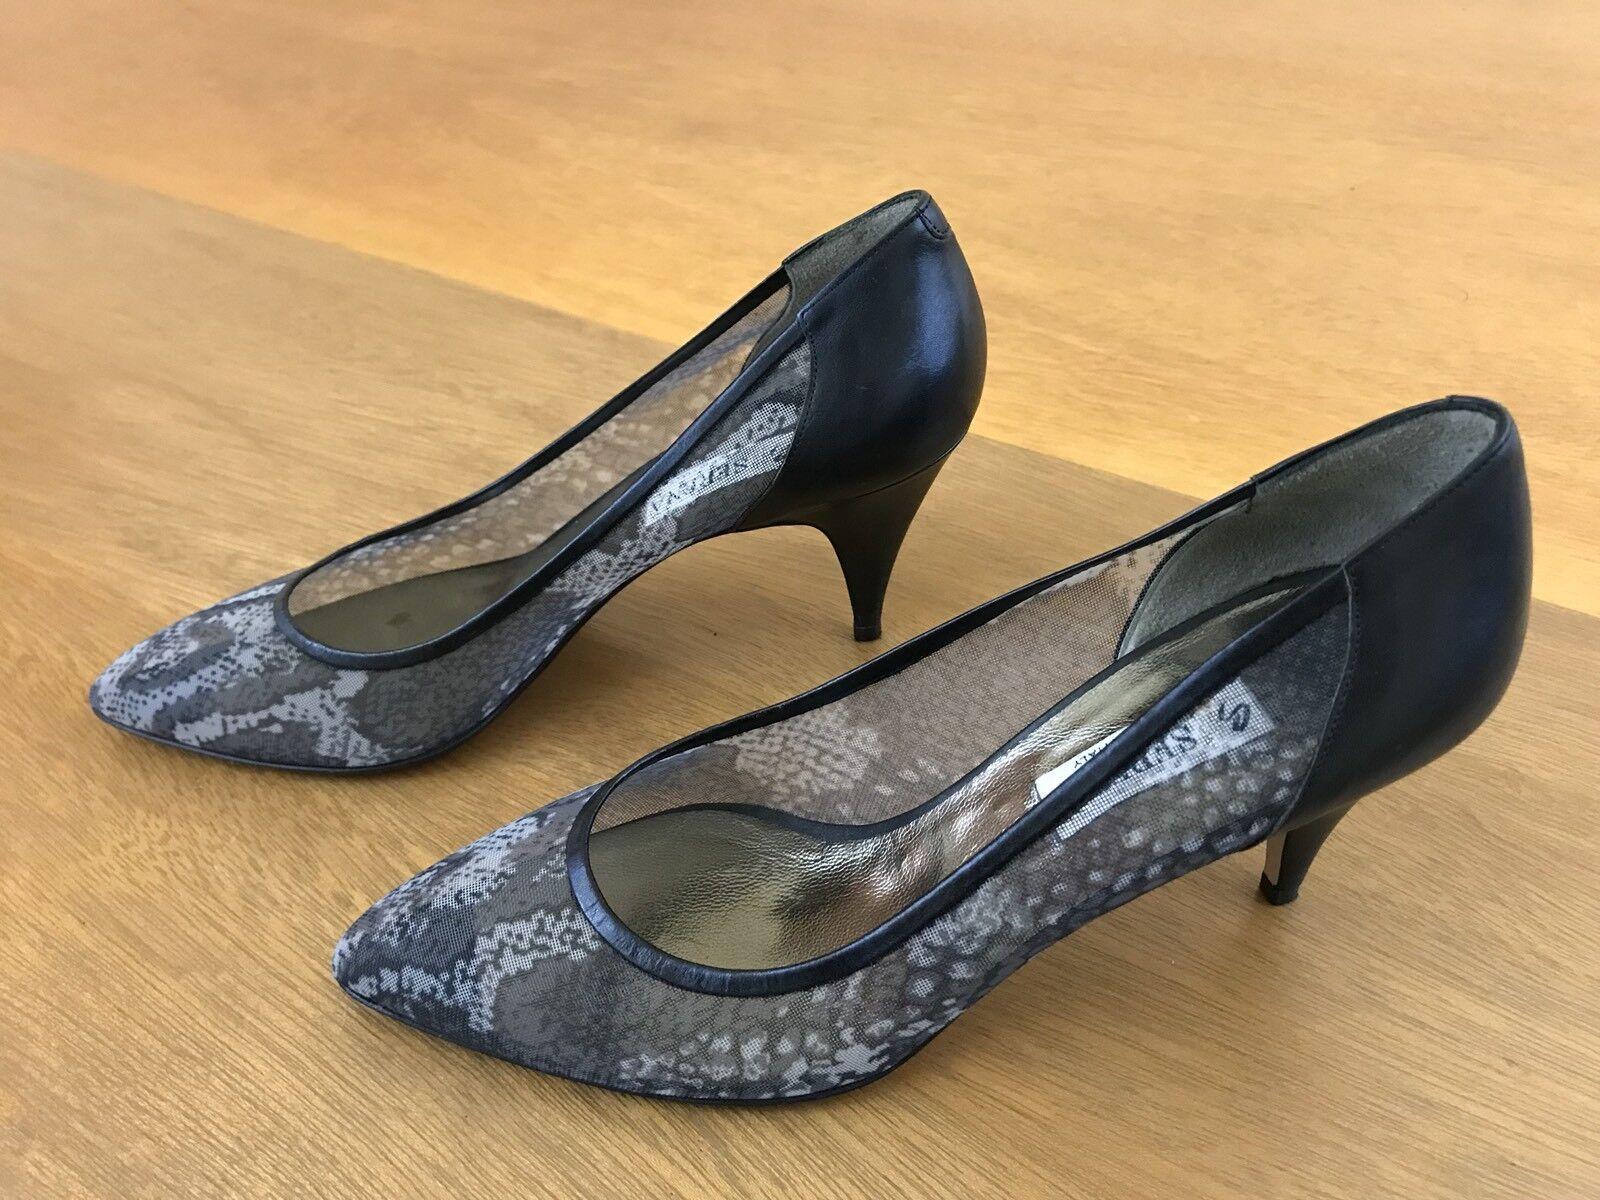 Serena Sheer Heels Damens's Größe 9 M Made In